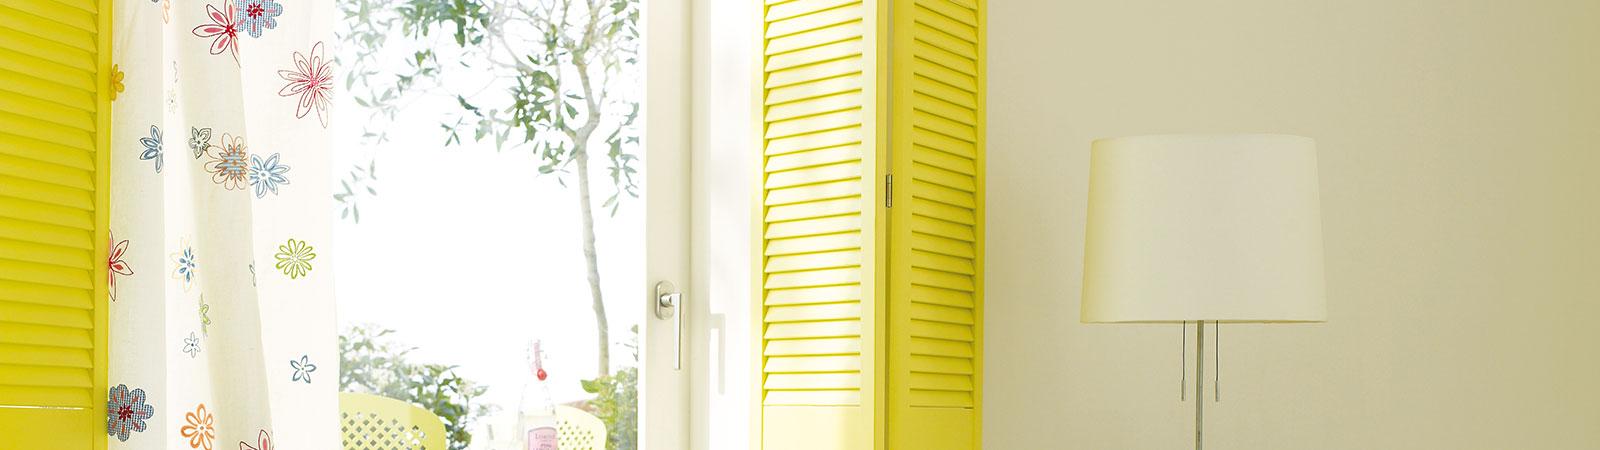 anstriche f r t ren osmo holz und color gmbh co kg. Black Bedroom Furniture Sets. Home Design Ideas